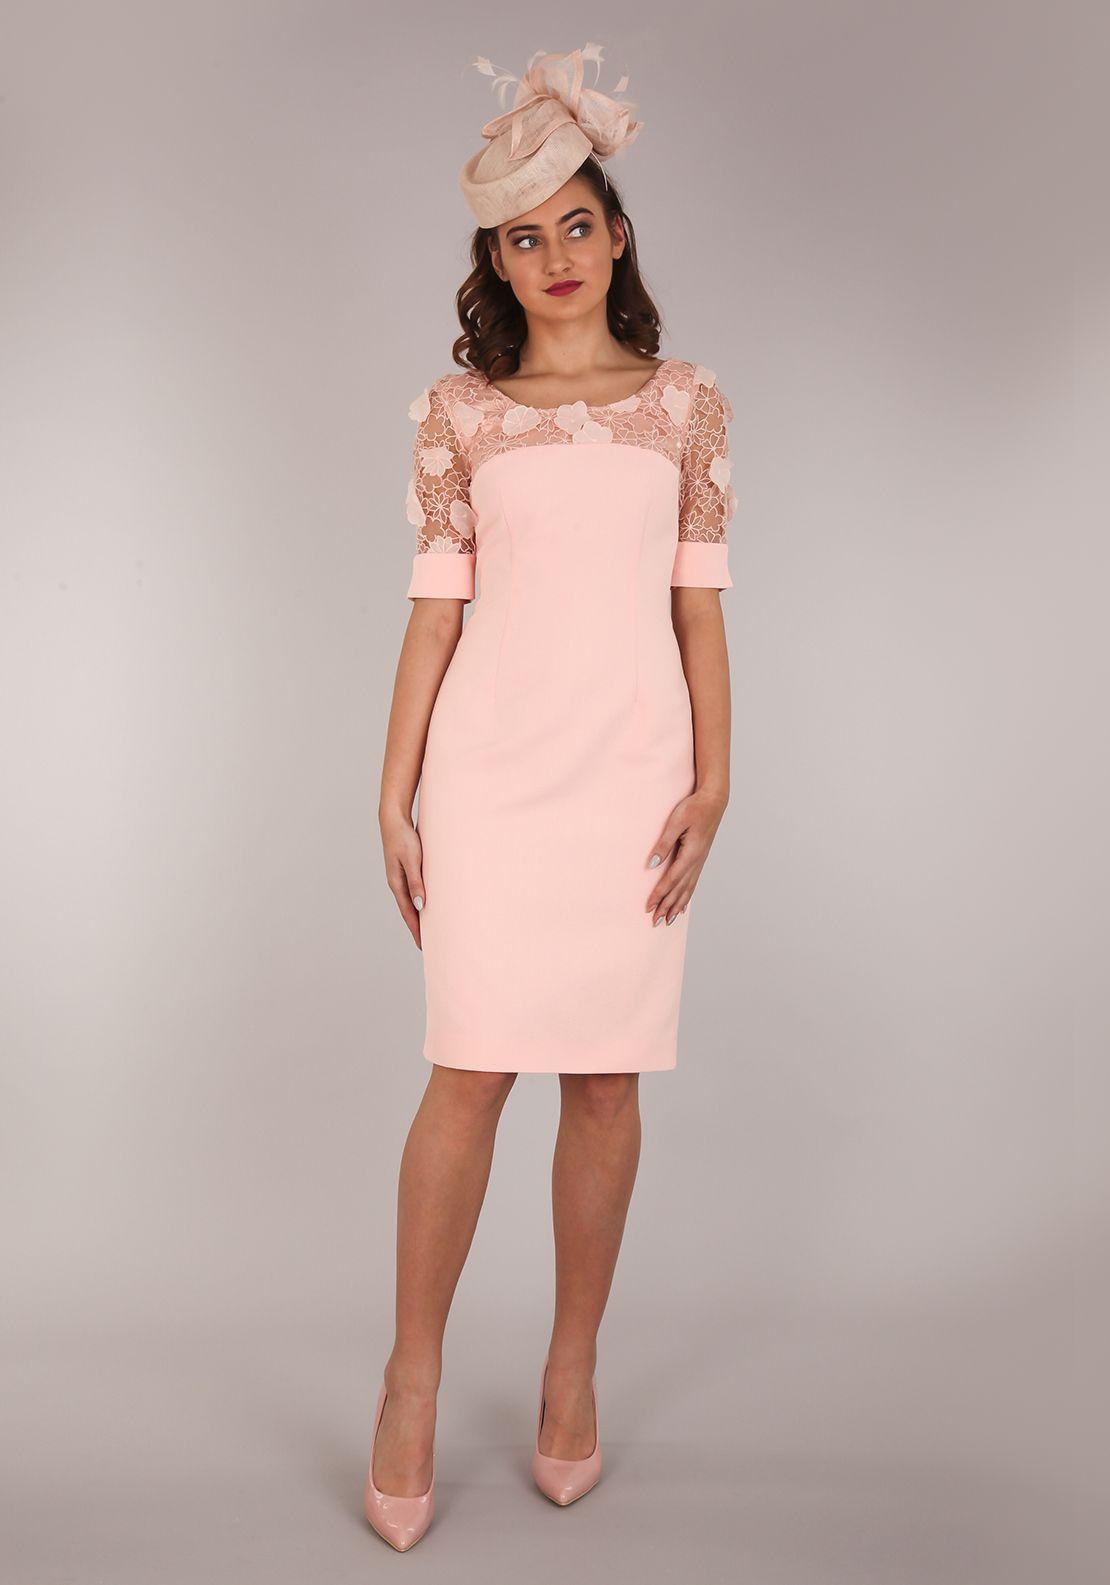 Aideen Bodkin Guava Pencil Dress, Apricot Pink | altinn | Pinterest ...